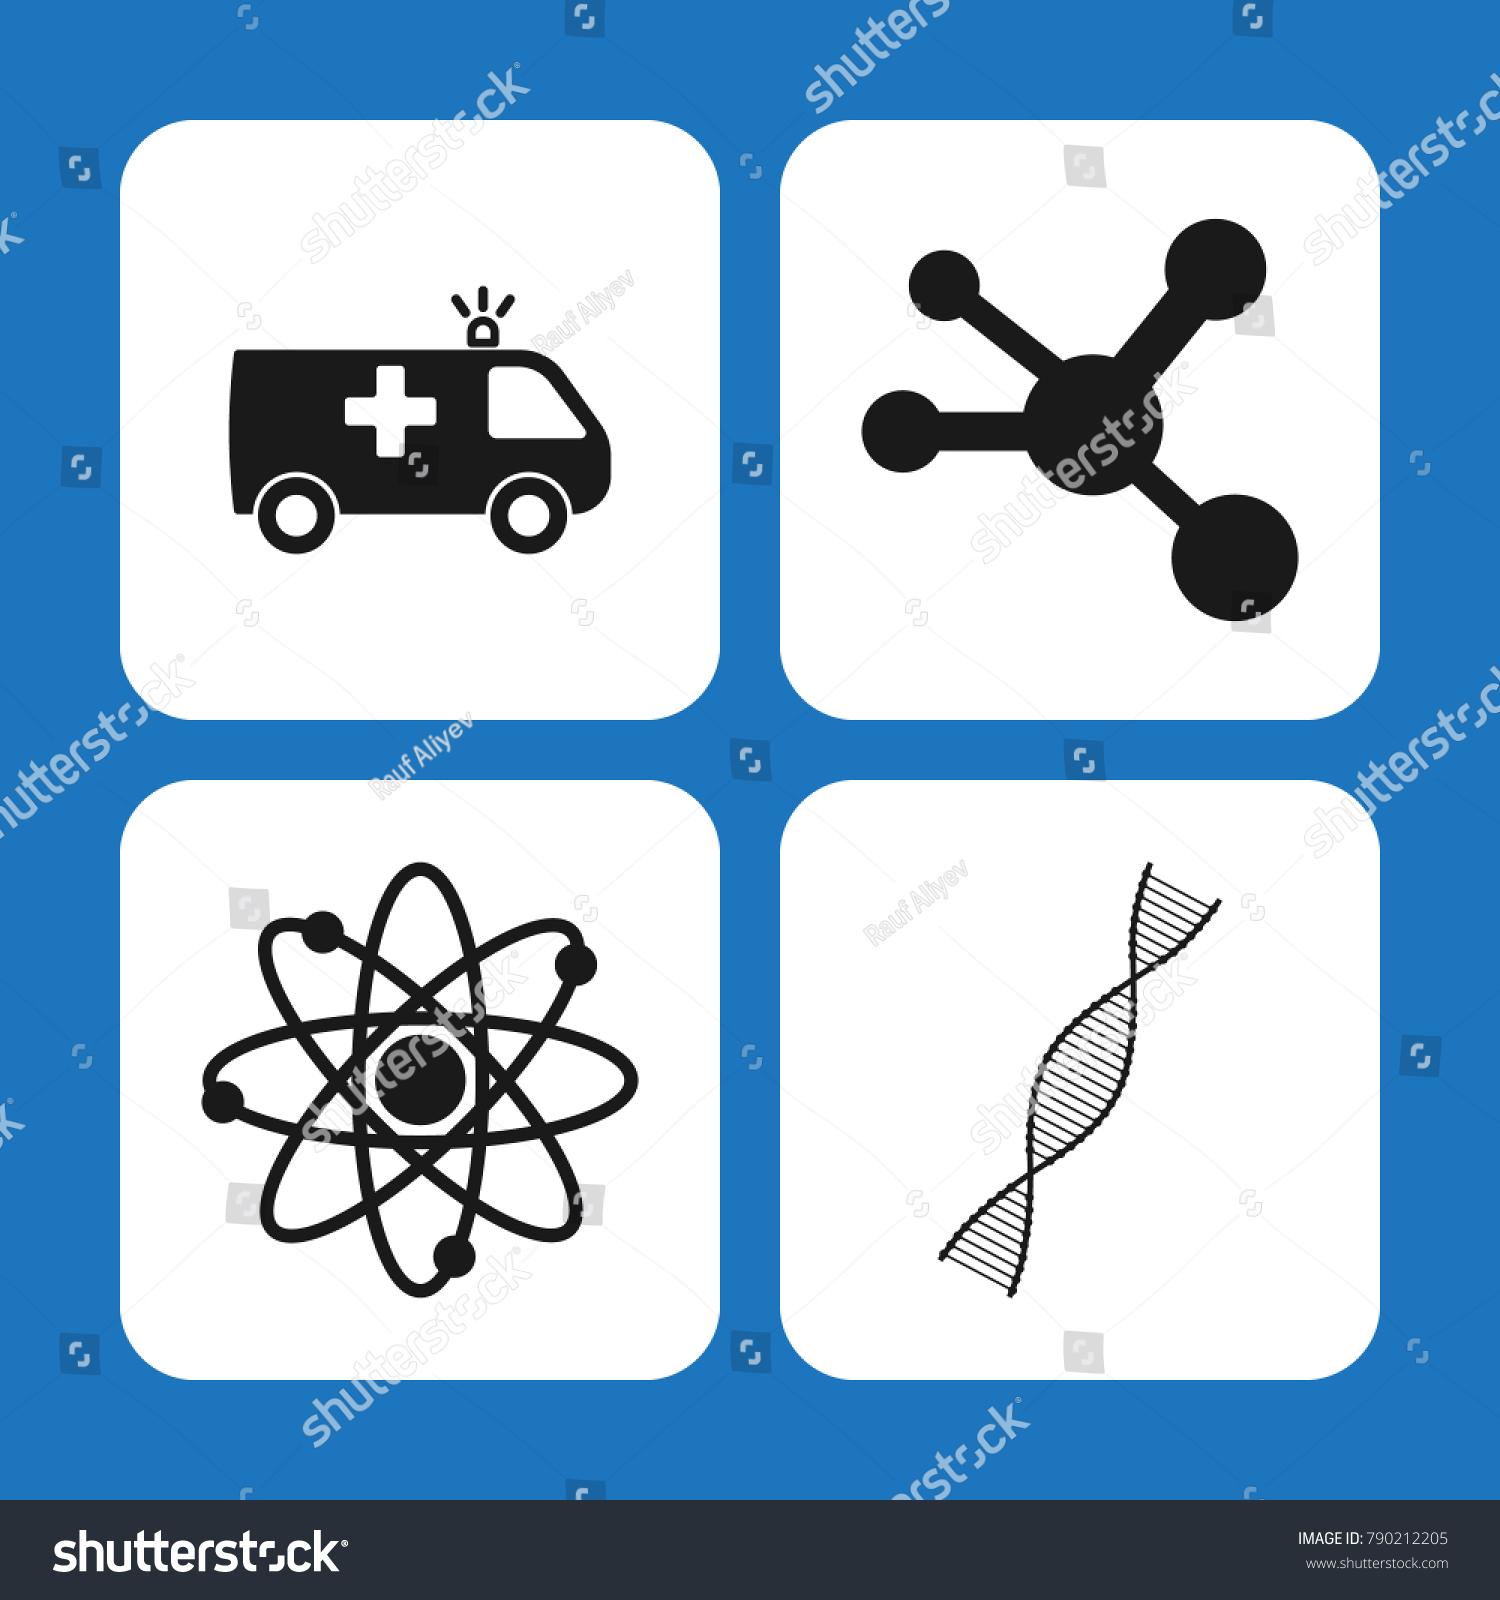 Molecule icon web element premium quality stock vector 790212205 molecule icon web element premium quality graphic design signs symbols collection simple buycottarizona Choice Image